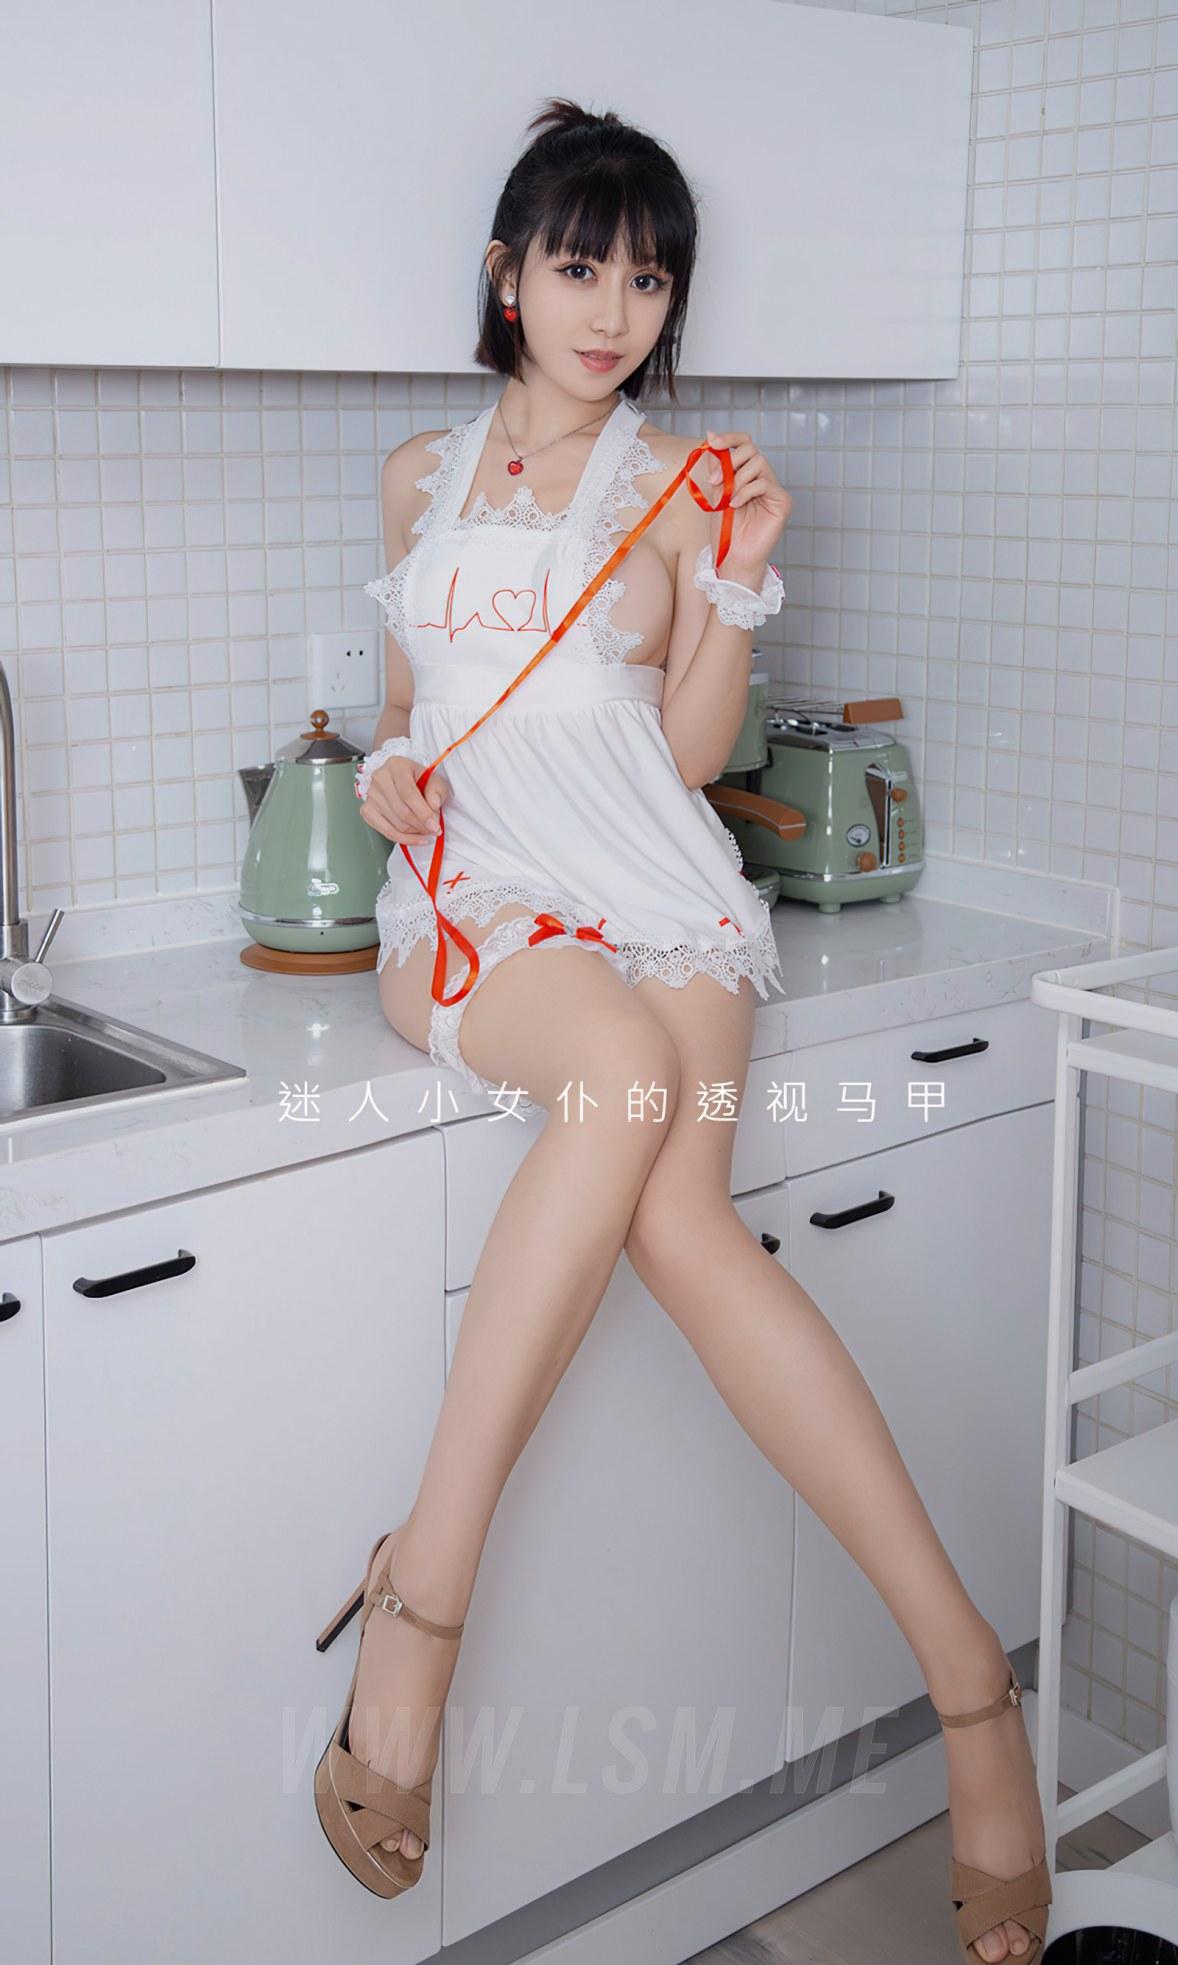 UGirls 爱尤物 No.2164  安妮丝朵拉 恋爱夹心酱 - 2